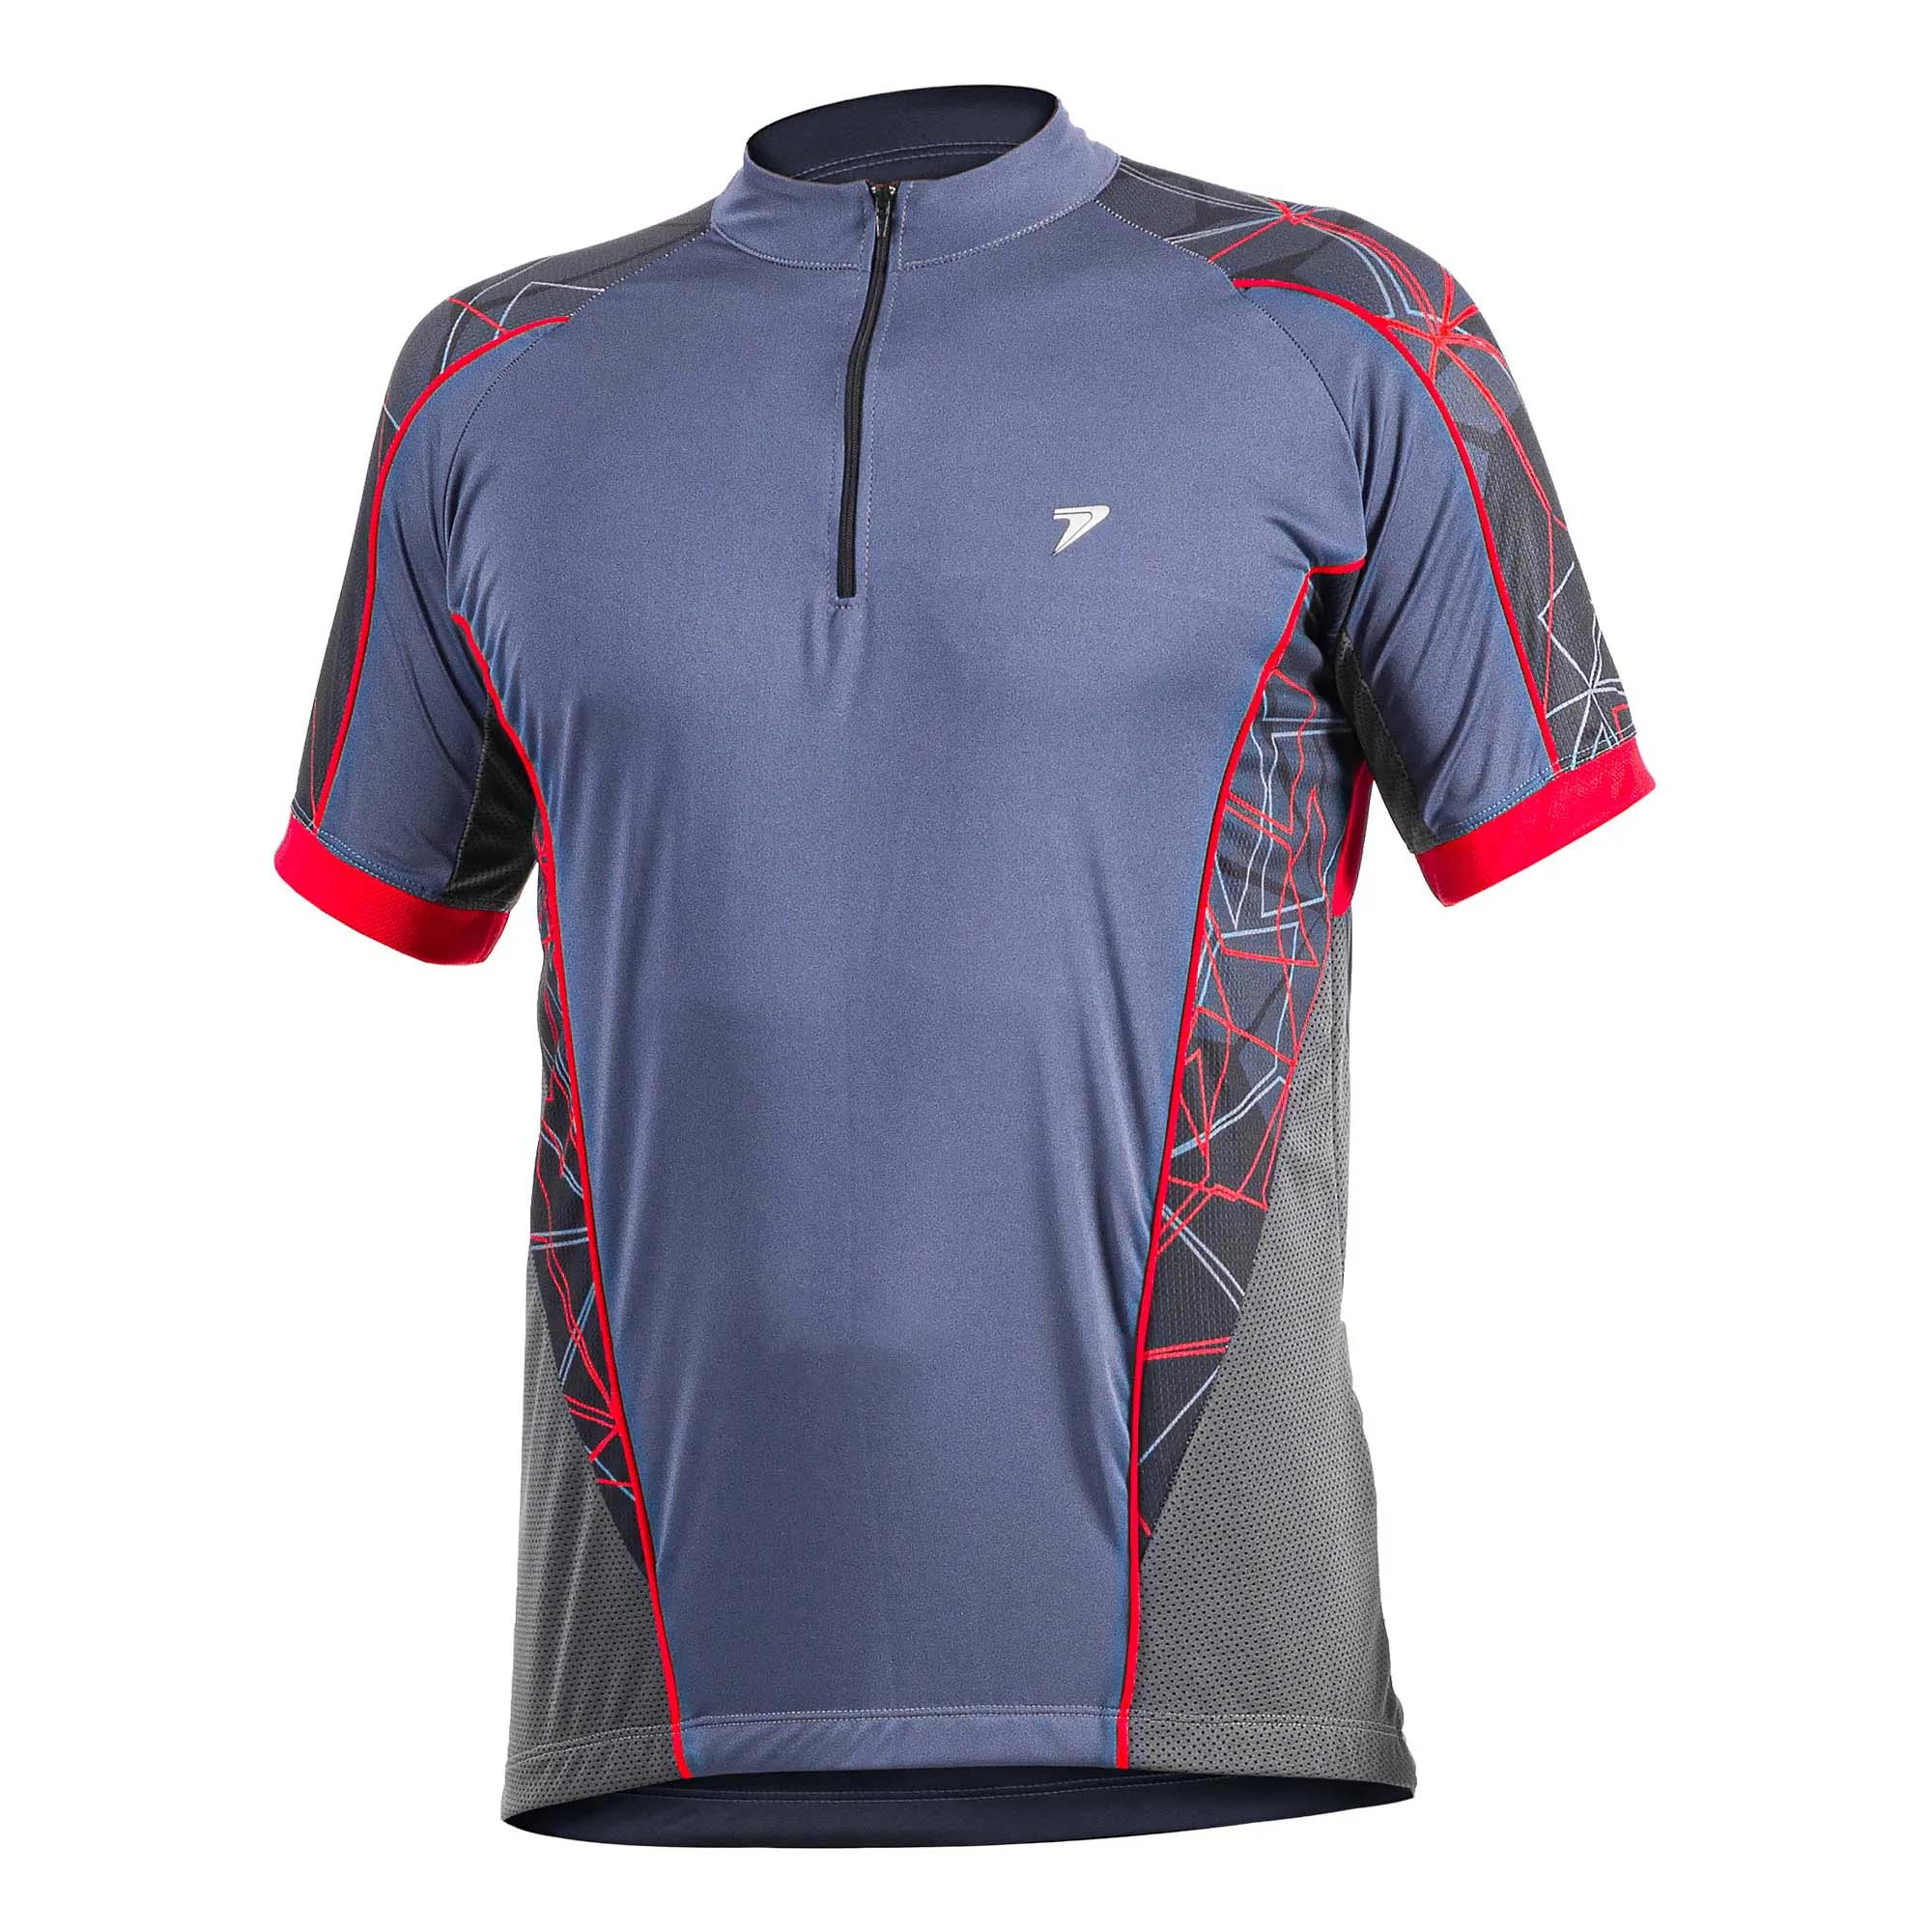 Camisa Ciclismo Fury Cinza/Preto/Vermelho  - Poker